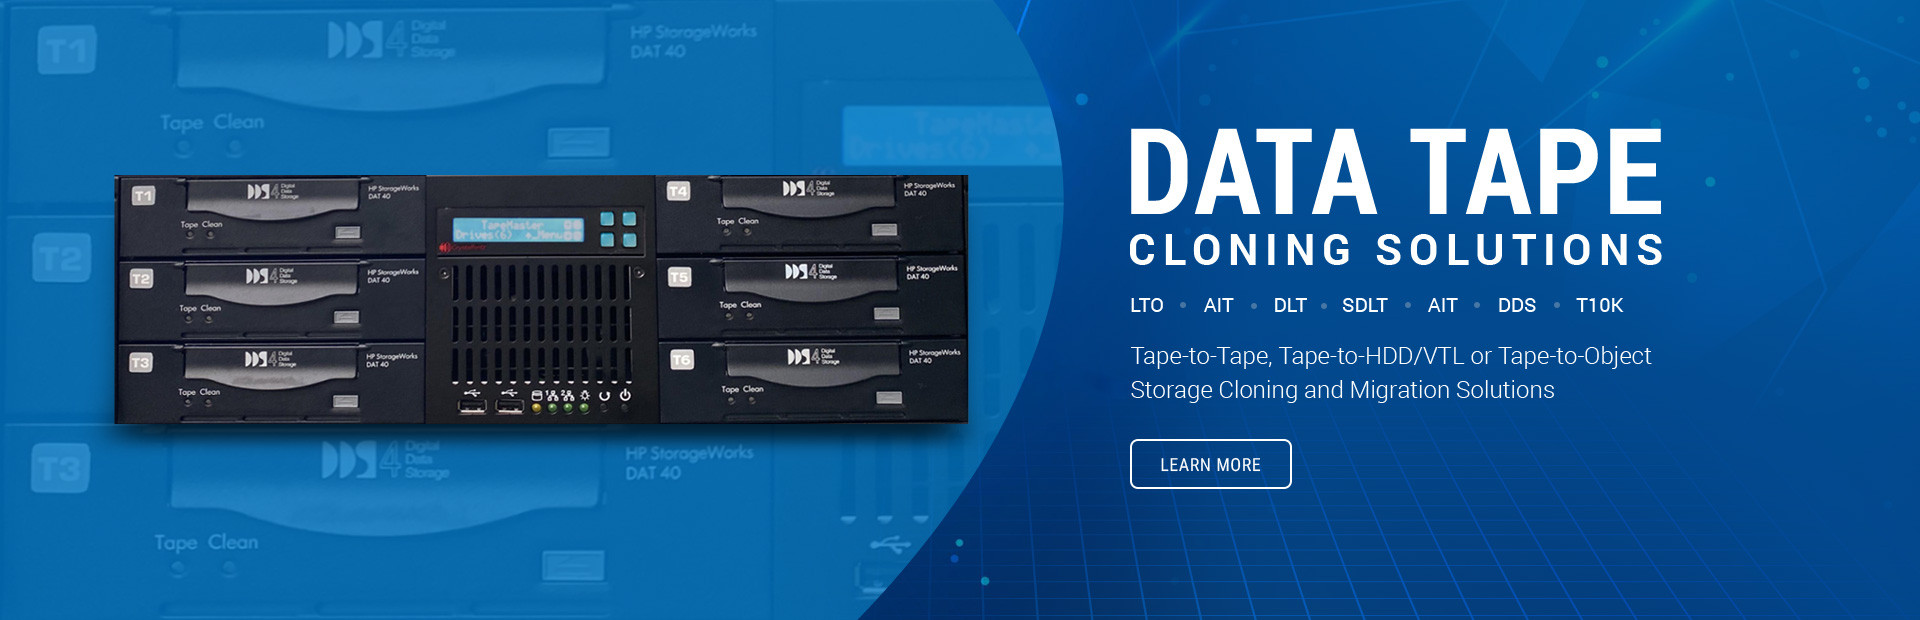 storage cloning